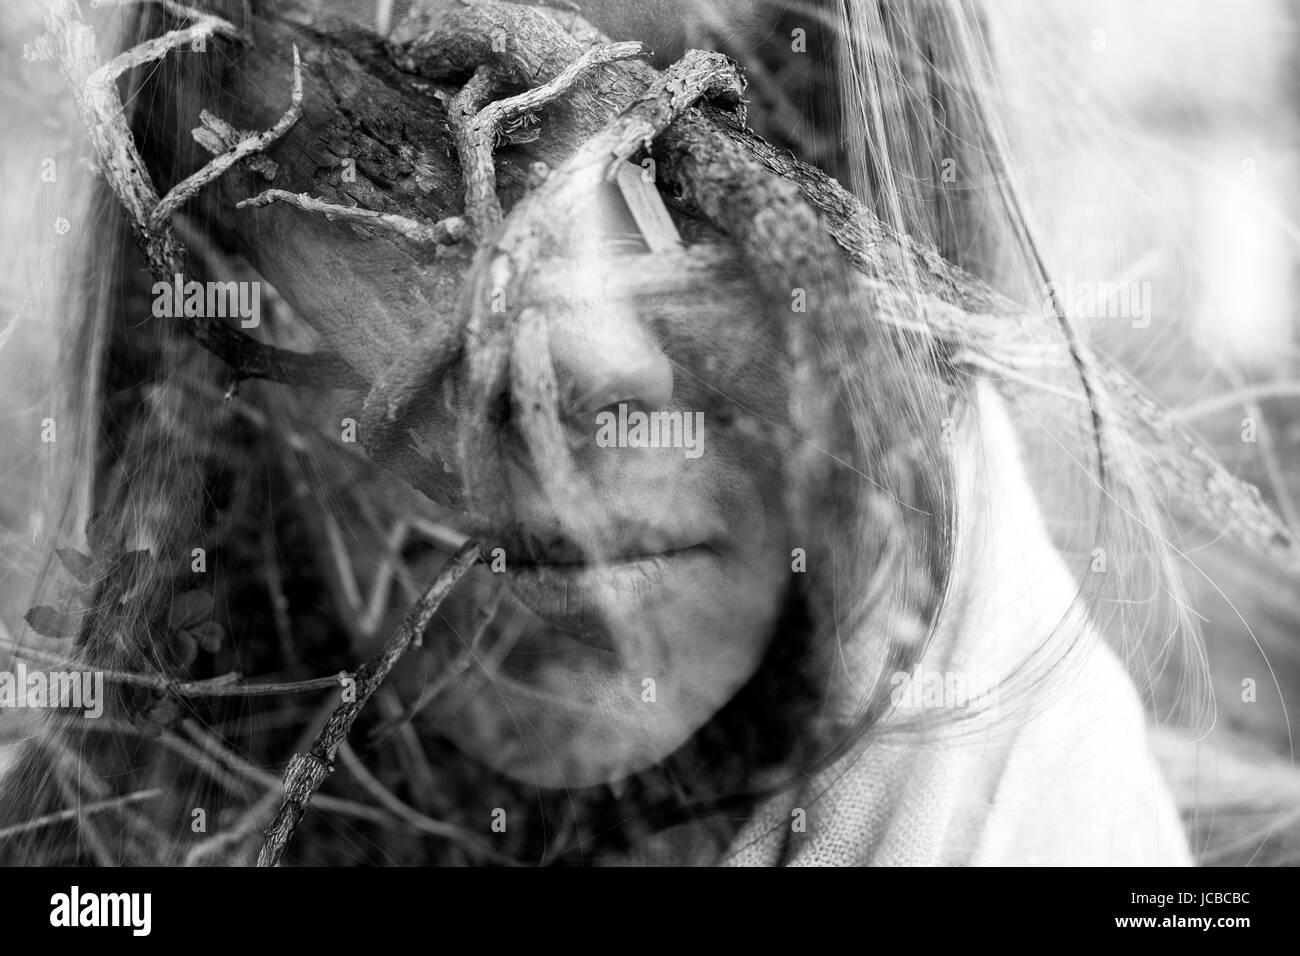 Doppelbelichtung kreatives Foto der traurige Frau Stockbild